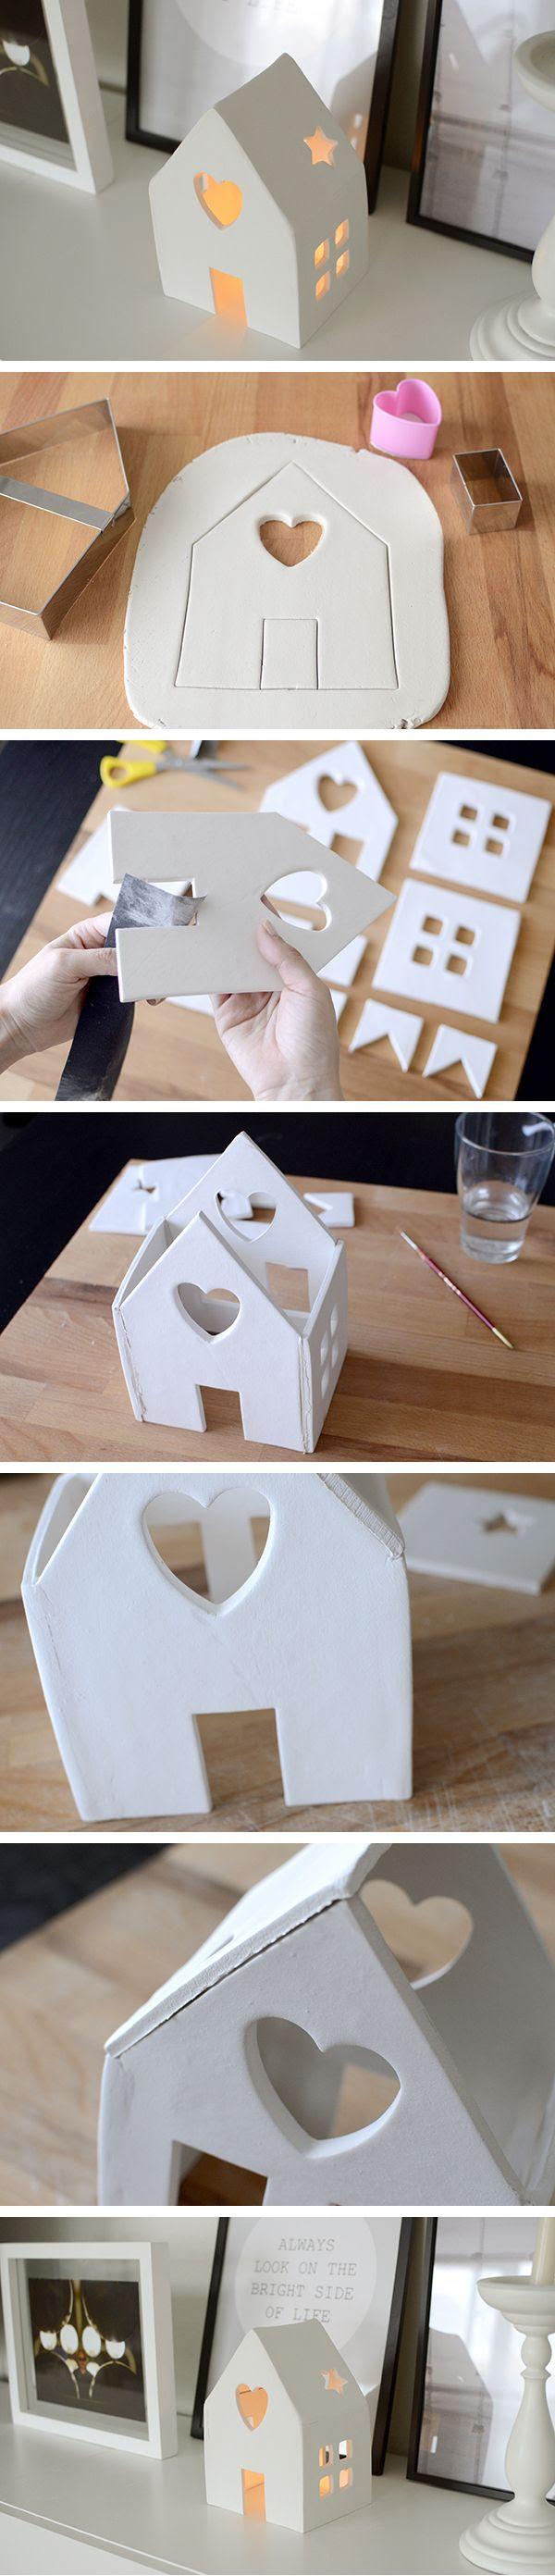 DIY: House candleholder with air dry clay - DIY: casita portavelas con pasta de modelar